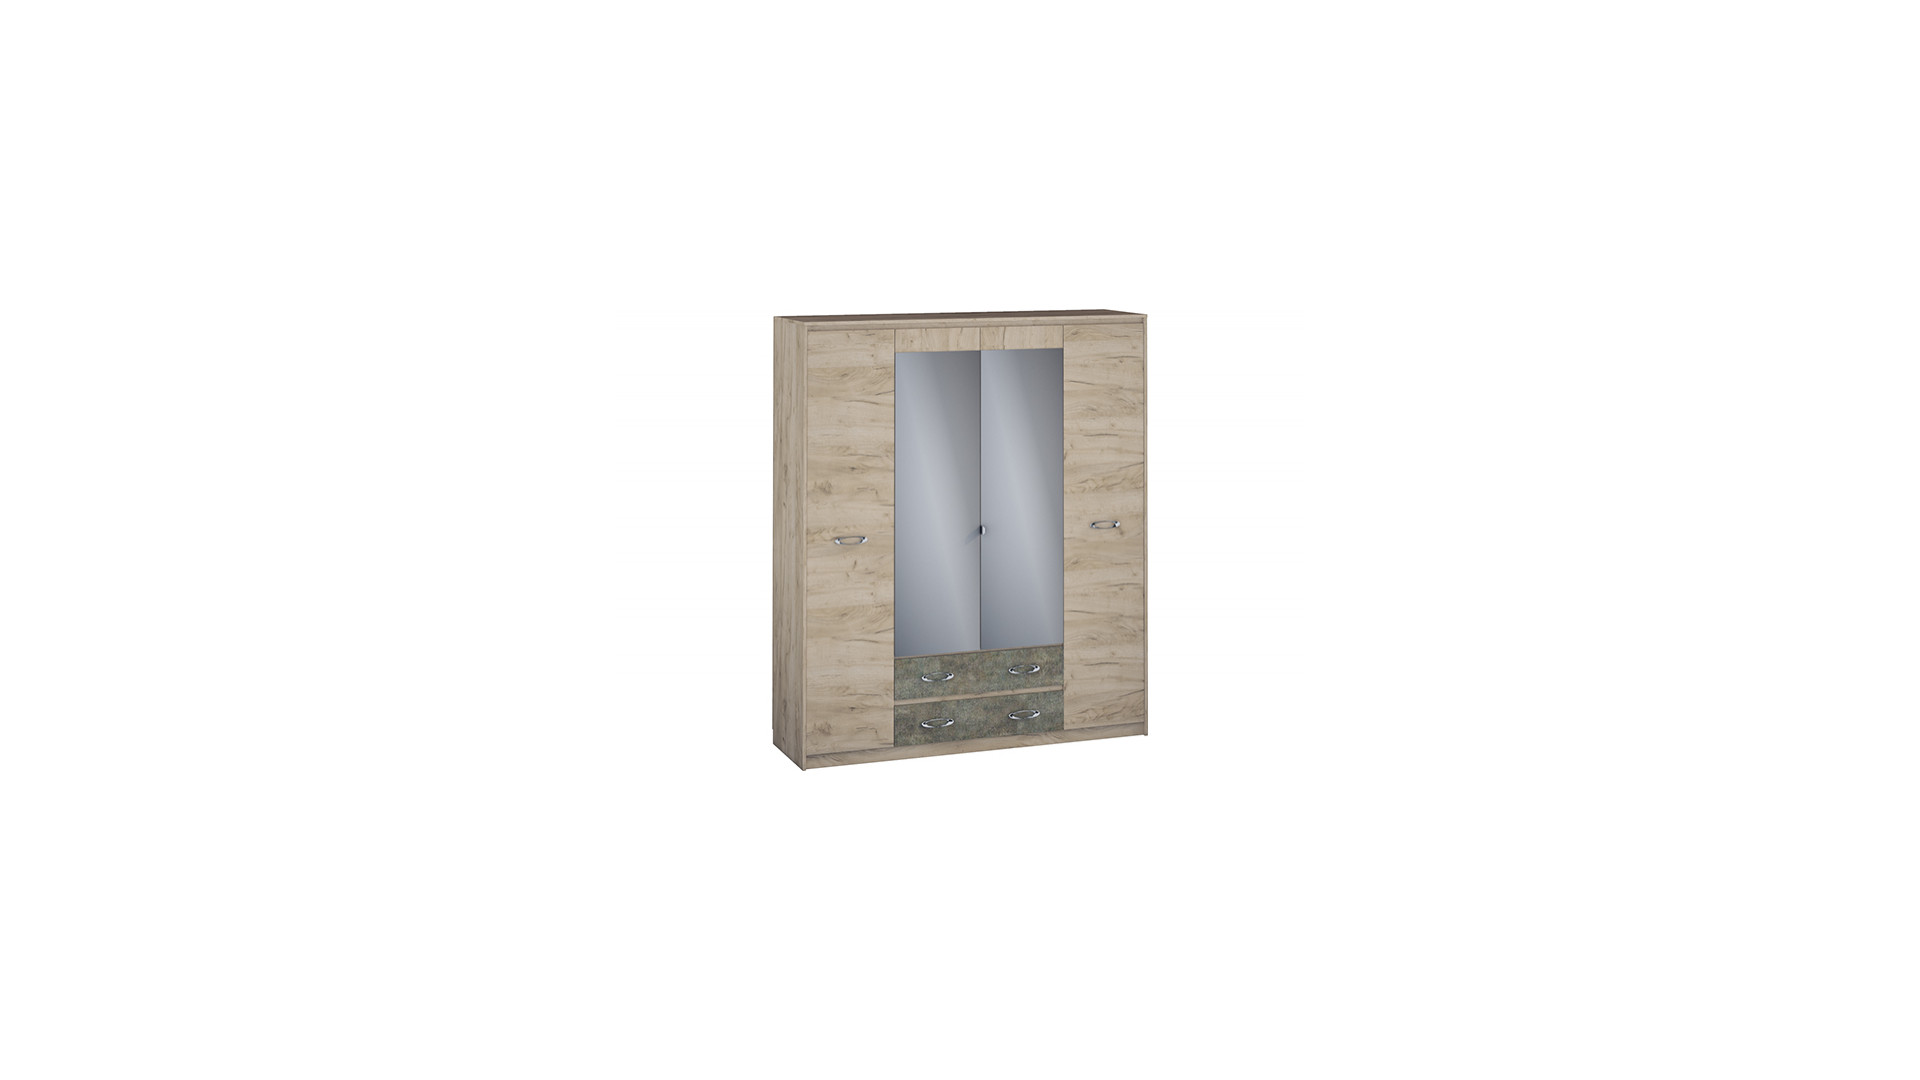 Шкаф  Дакота 4х ст. с ящиками (540) ЛДСП Серый Крафт/Тиз Серый